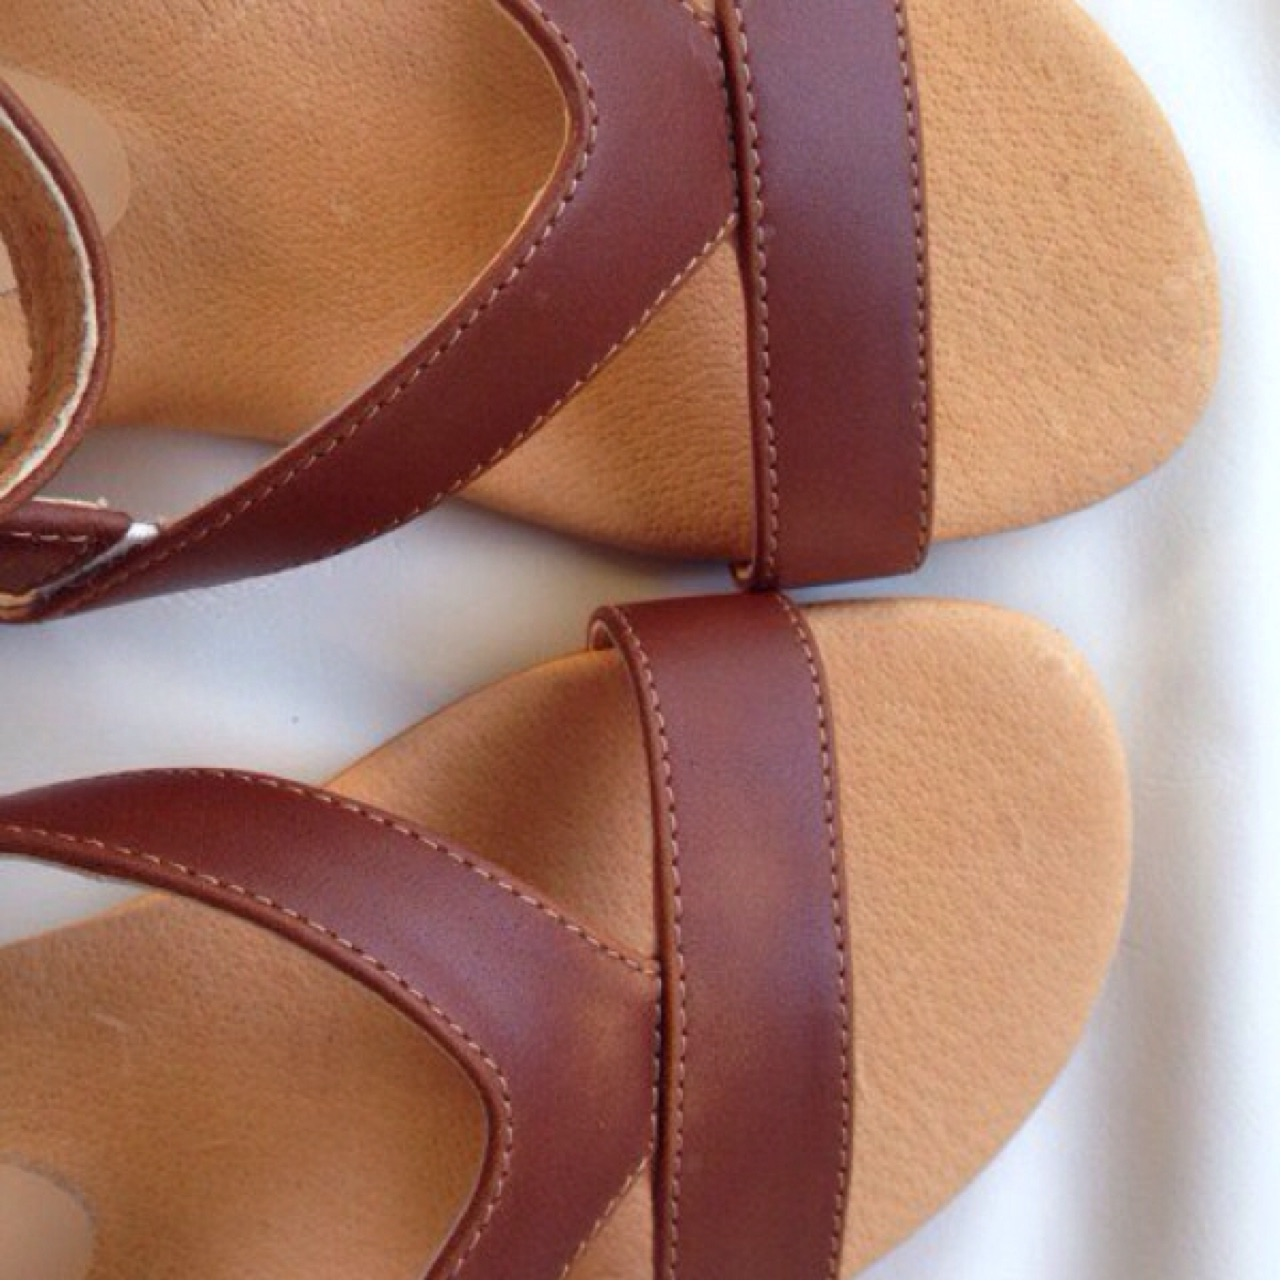 Wabin,ร้องเท้า,รองเท้าผู้หญิง,รองเท้ารัดข้อ,รองเท้าหนัง